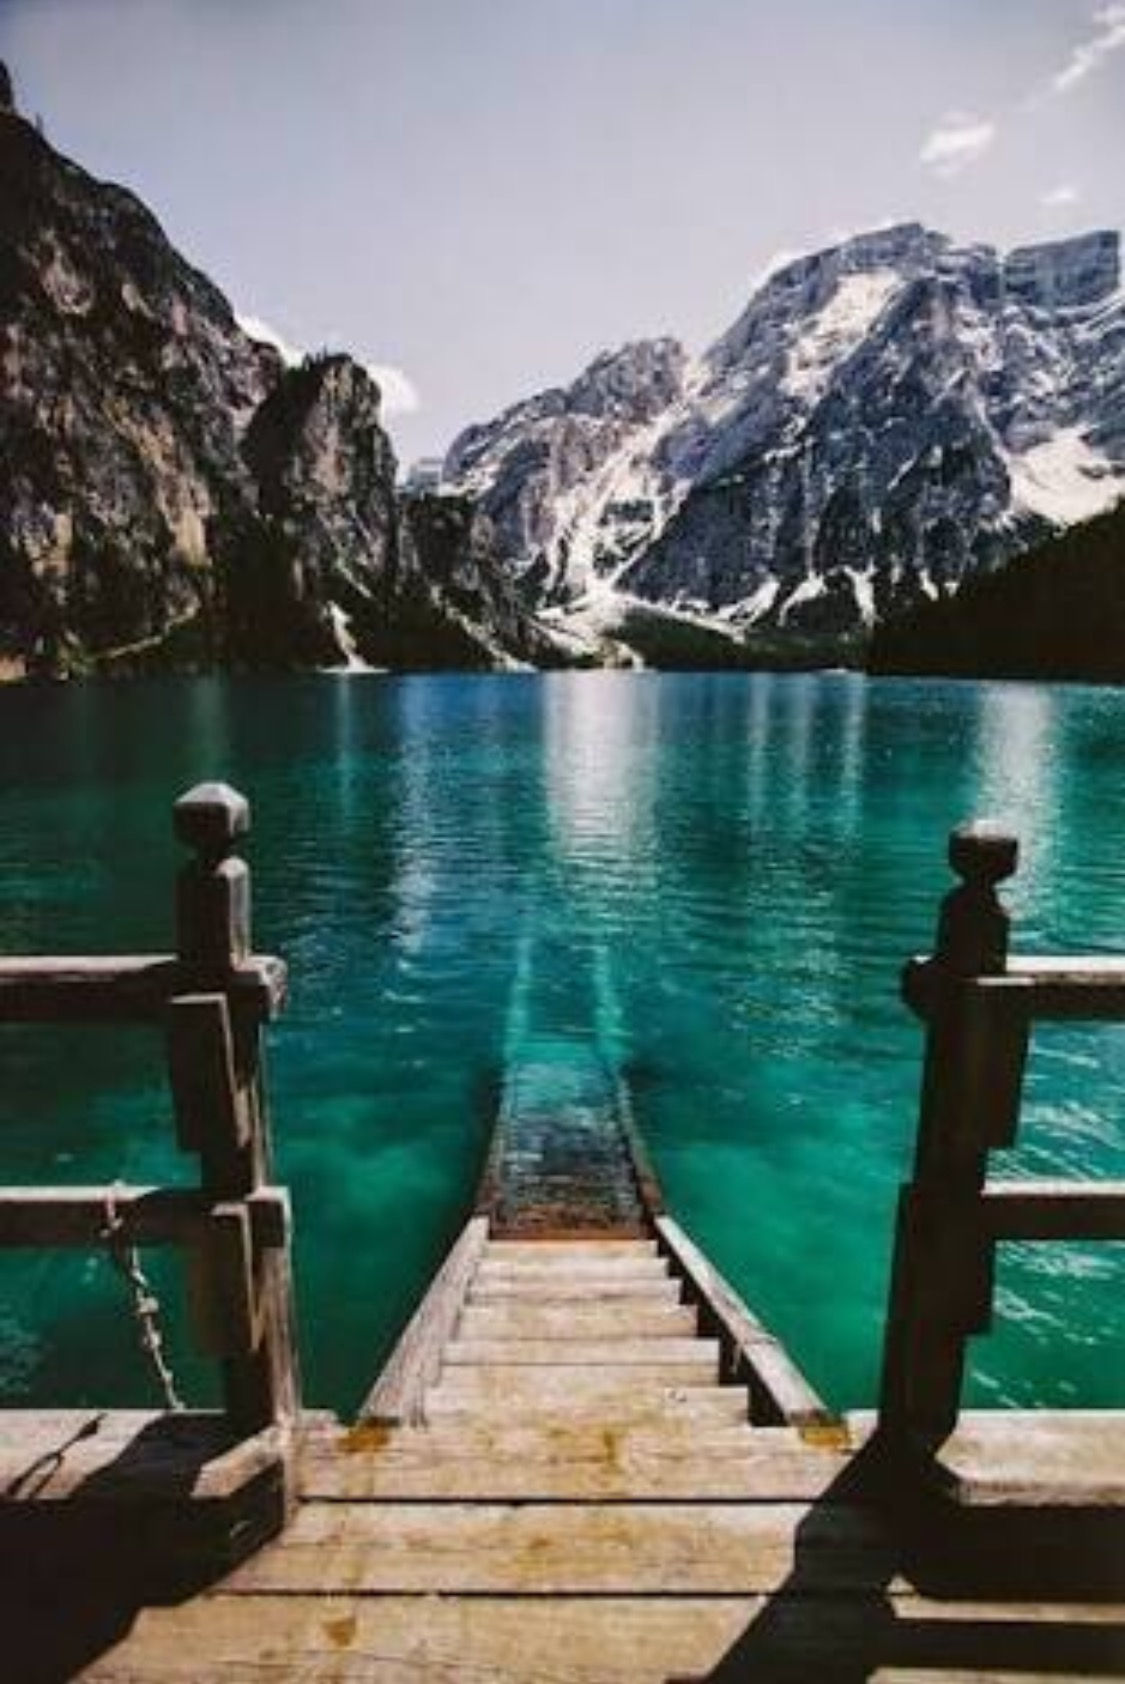 Lago Di Braies Italy Slaylebrity